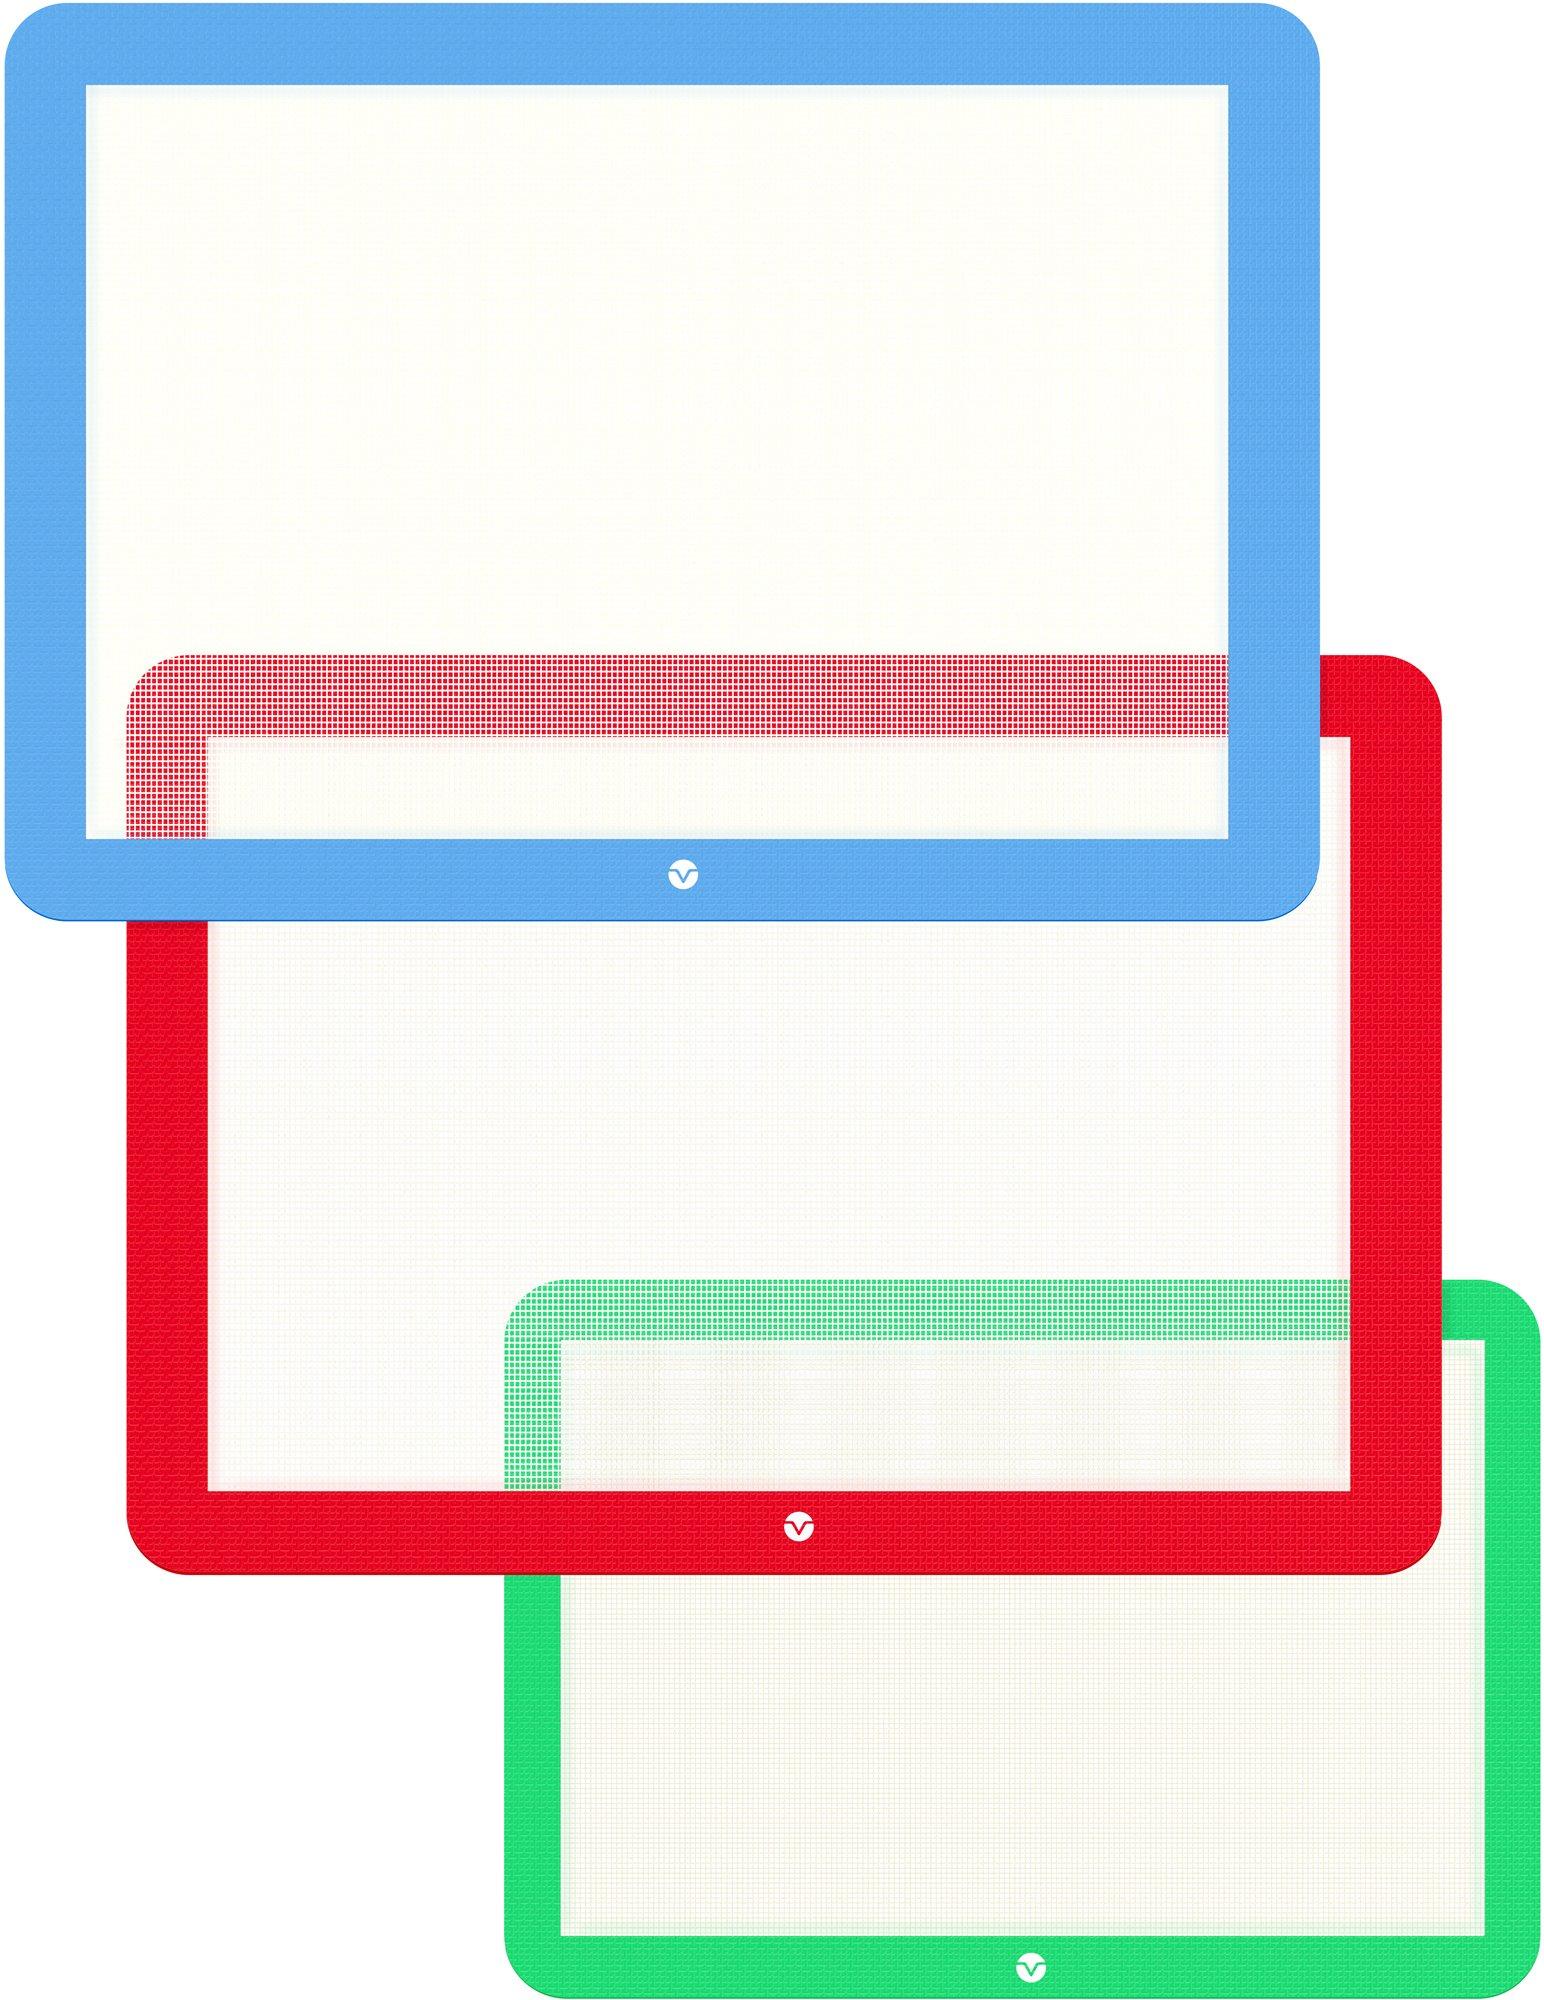 Vremi 3 Piece Silicone Baking Mat Set - Silicone Mat for Baking Sheets Nonstick - Half Quarter Sheet Silicone Baking Mats for Cookie Sheet Pans - Rolling Silicone Baking Sheet Non Stick Cooking Mats by Vremi